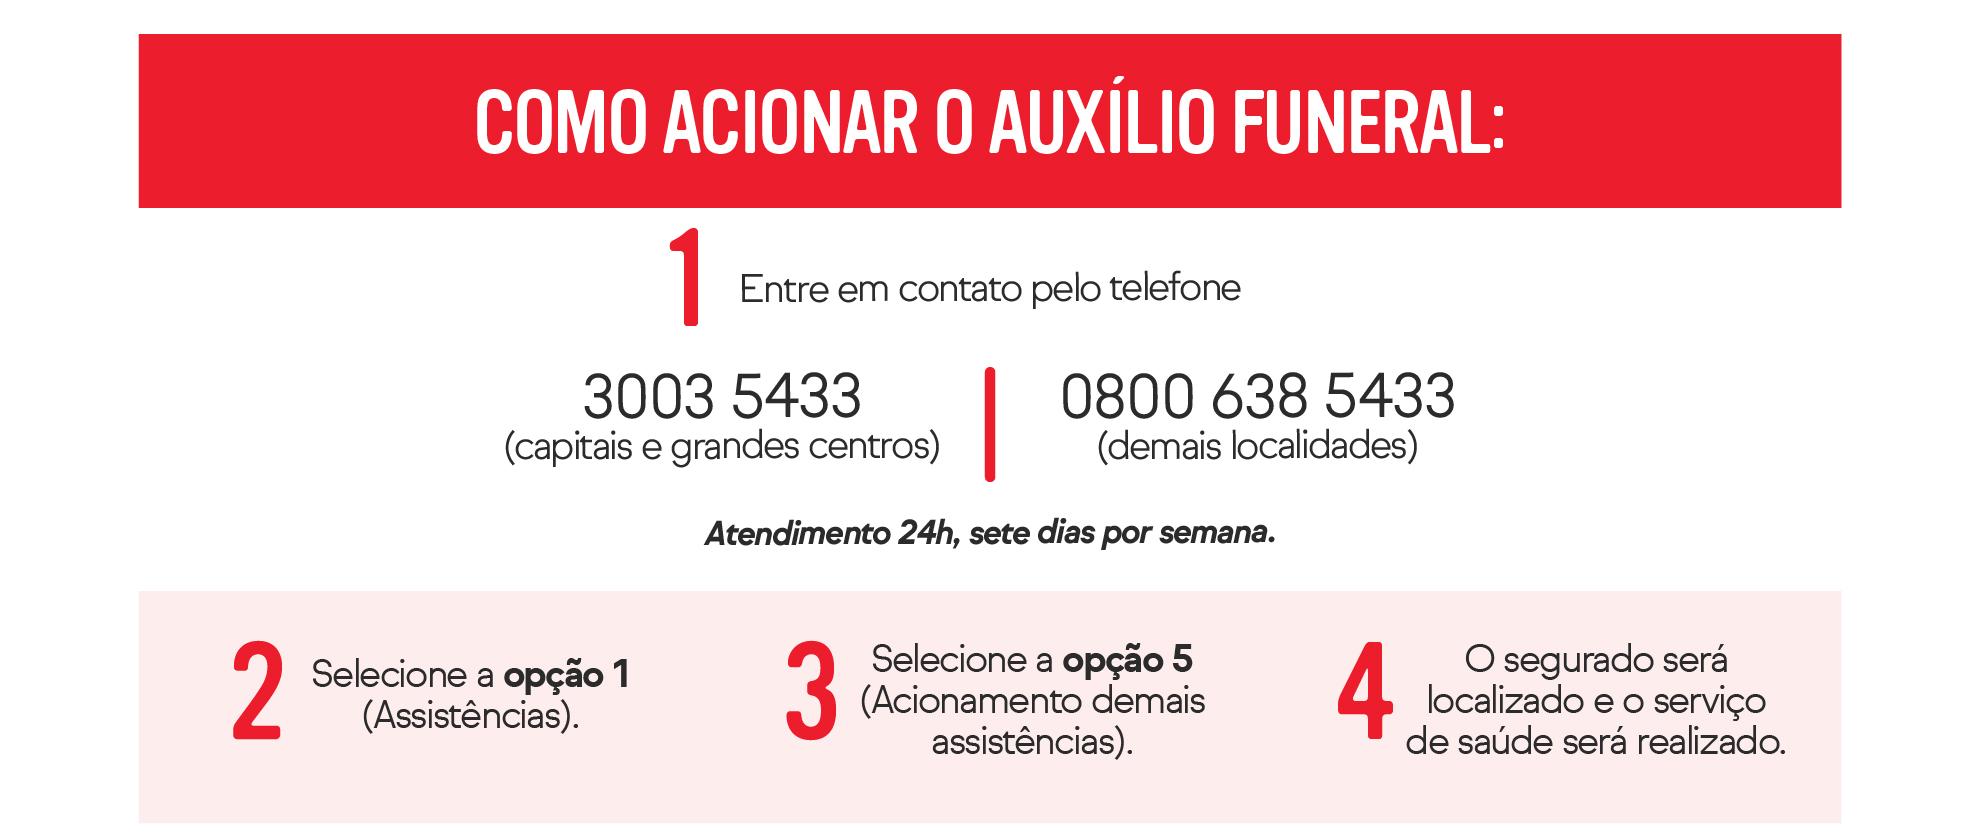 como acionar o auxílio funeral do seguro de vida ifood para entregadores